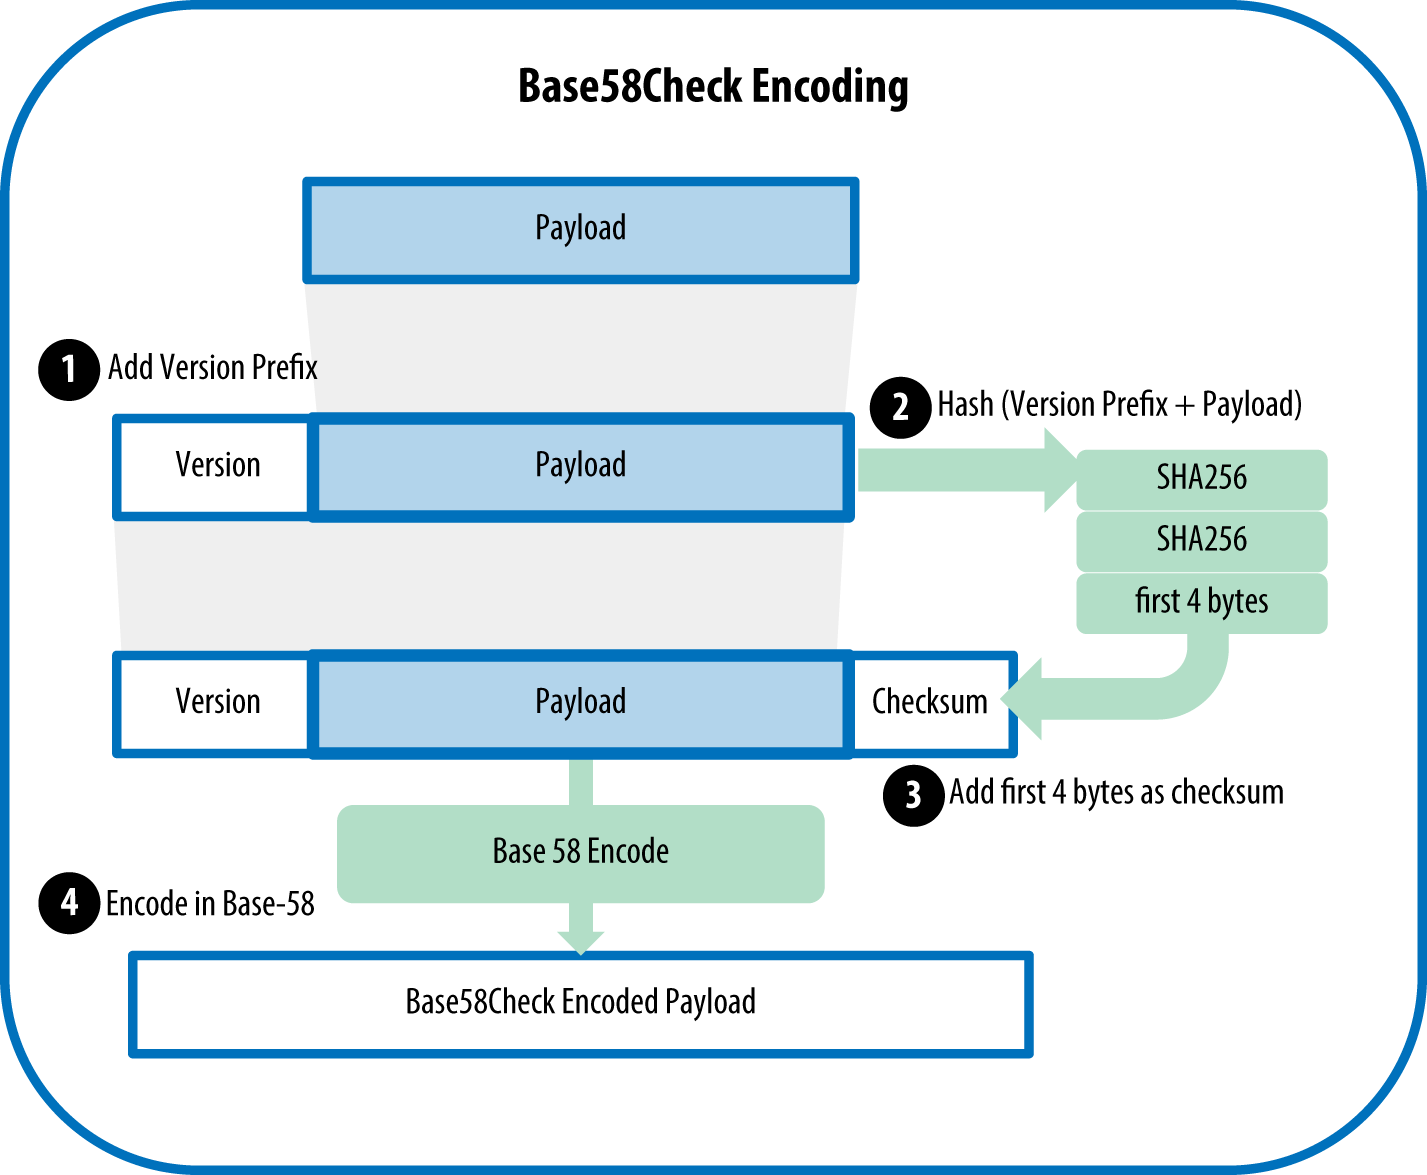 图4-6Base58Check编码的过程